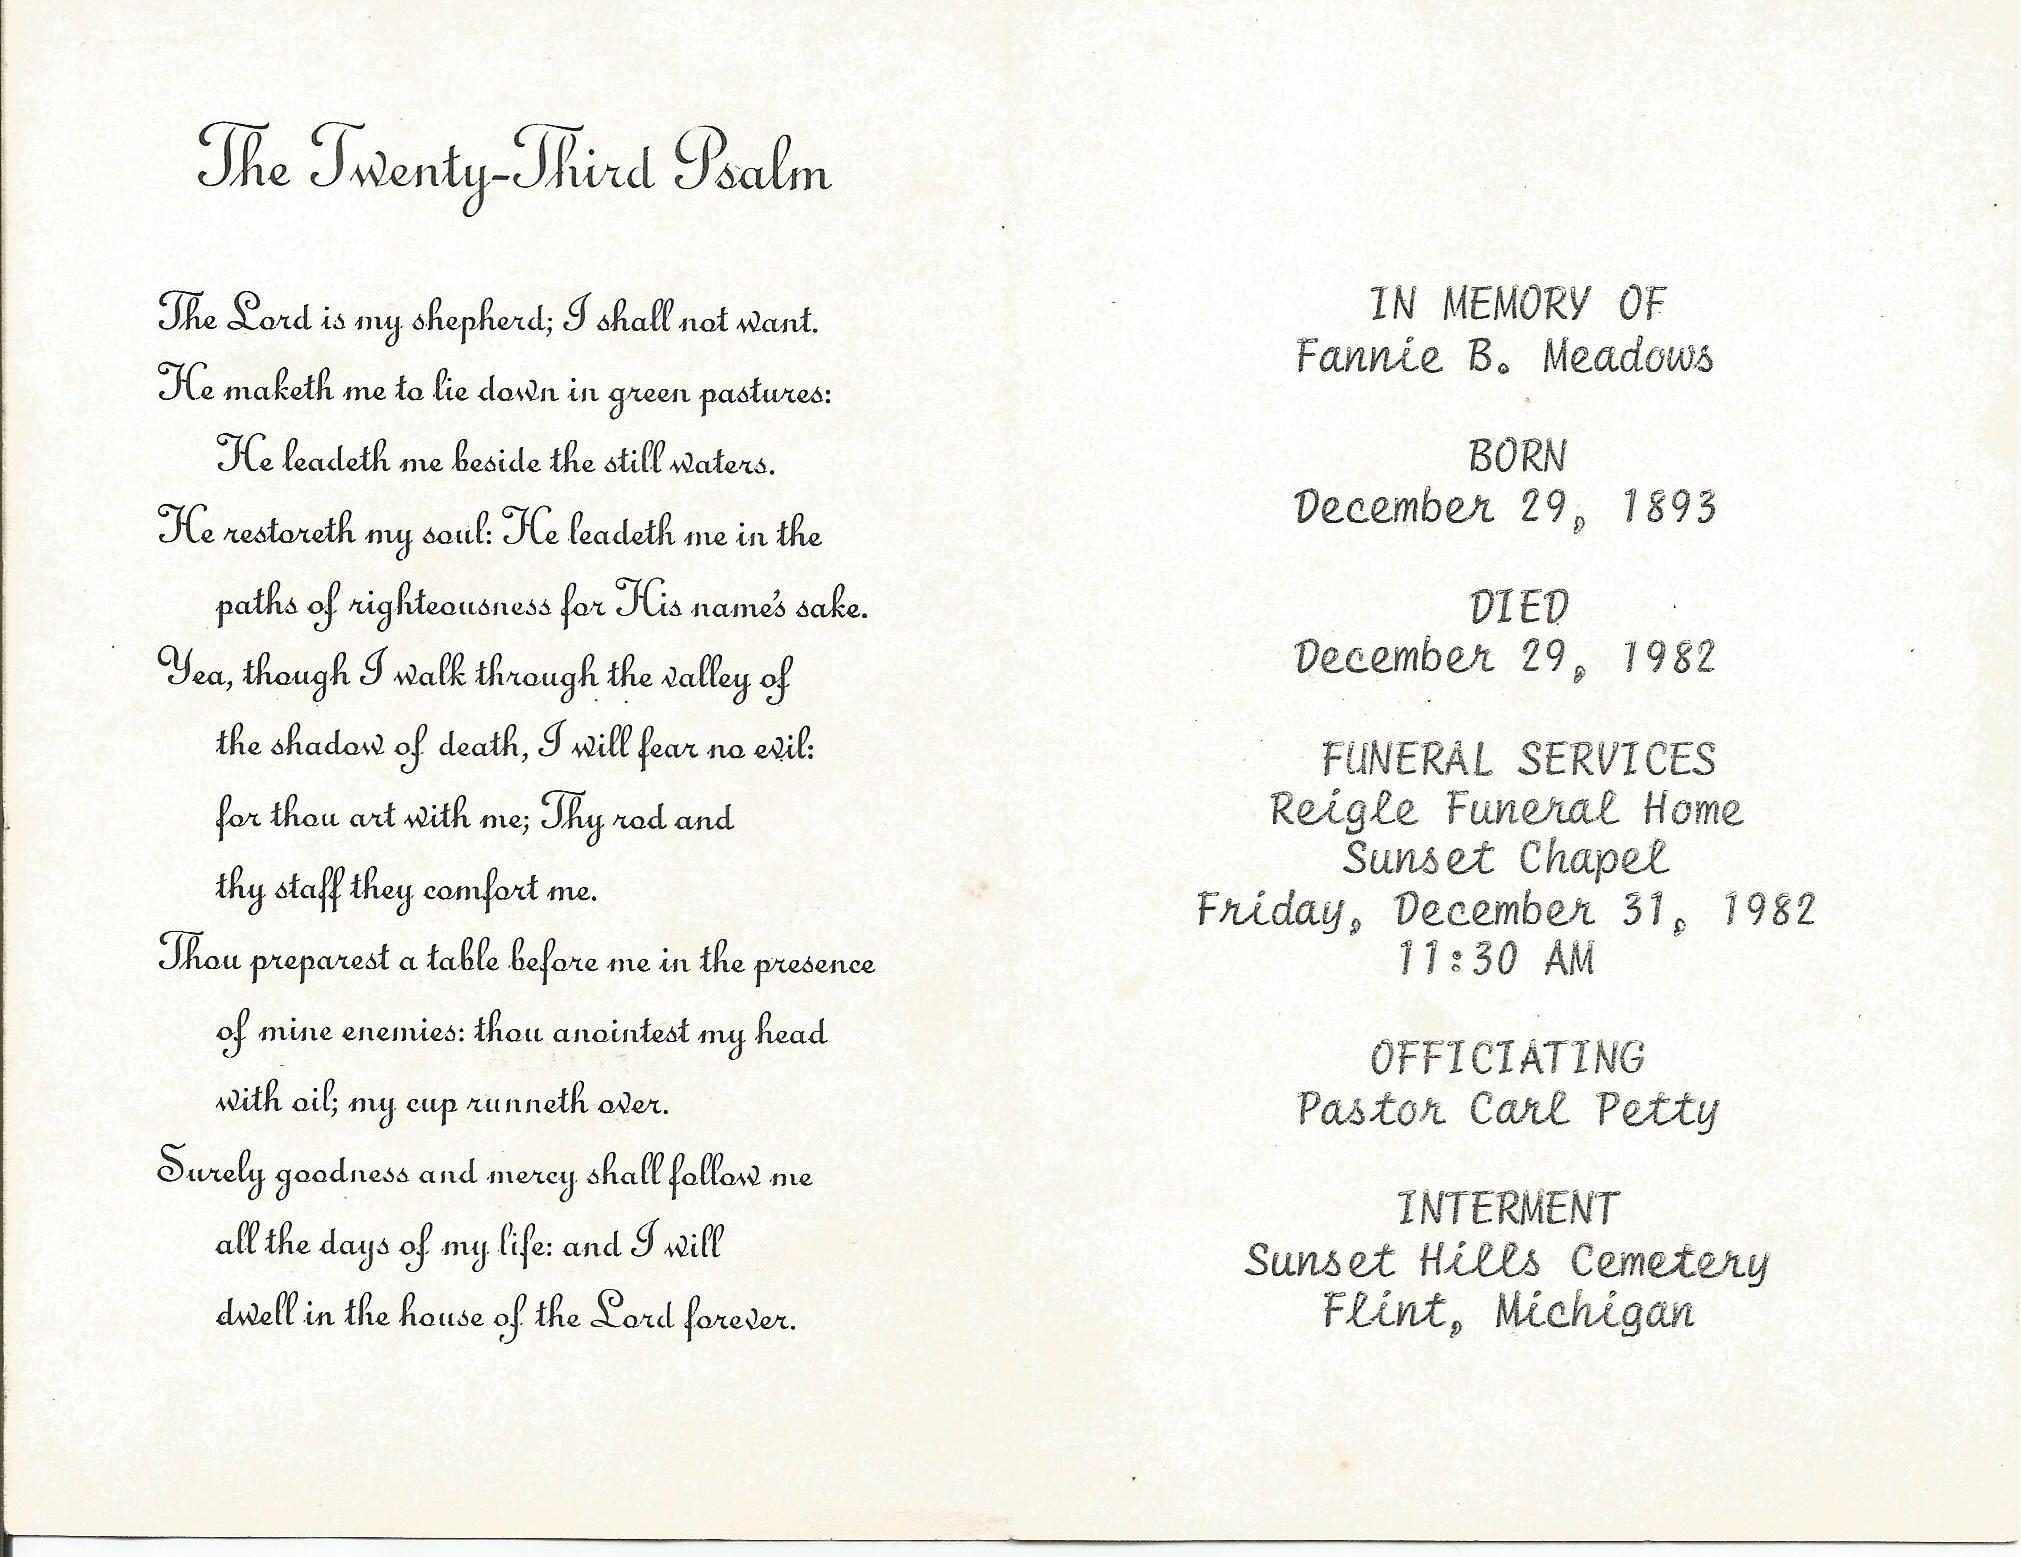 gma meadows funeral card